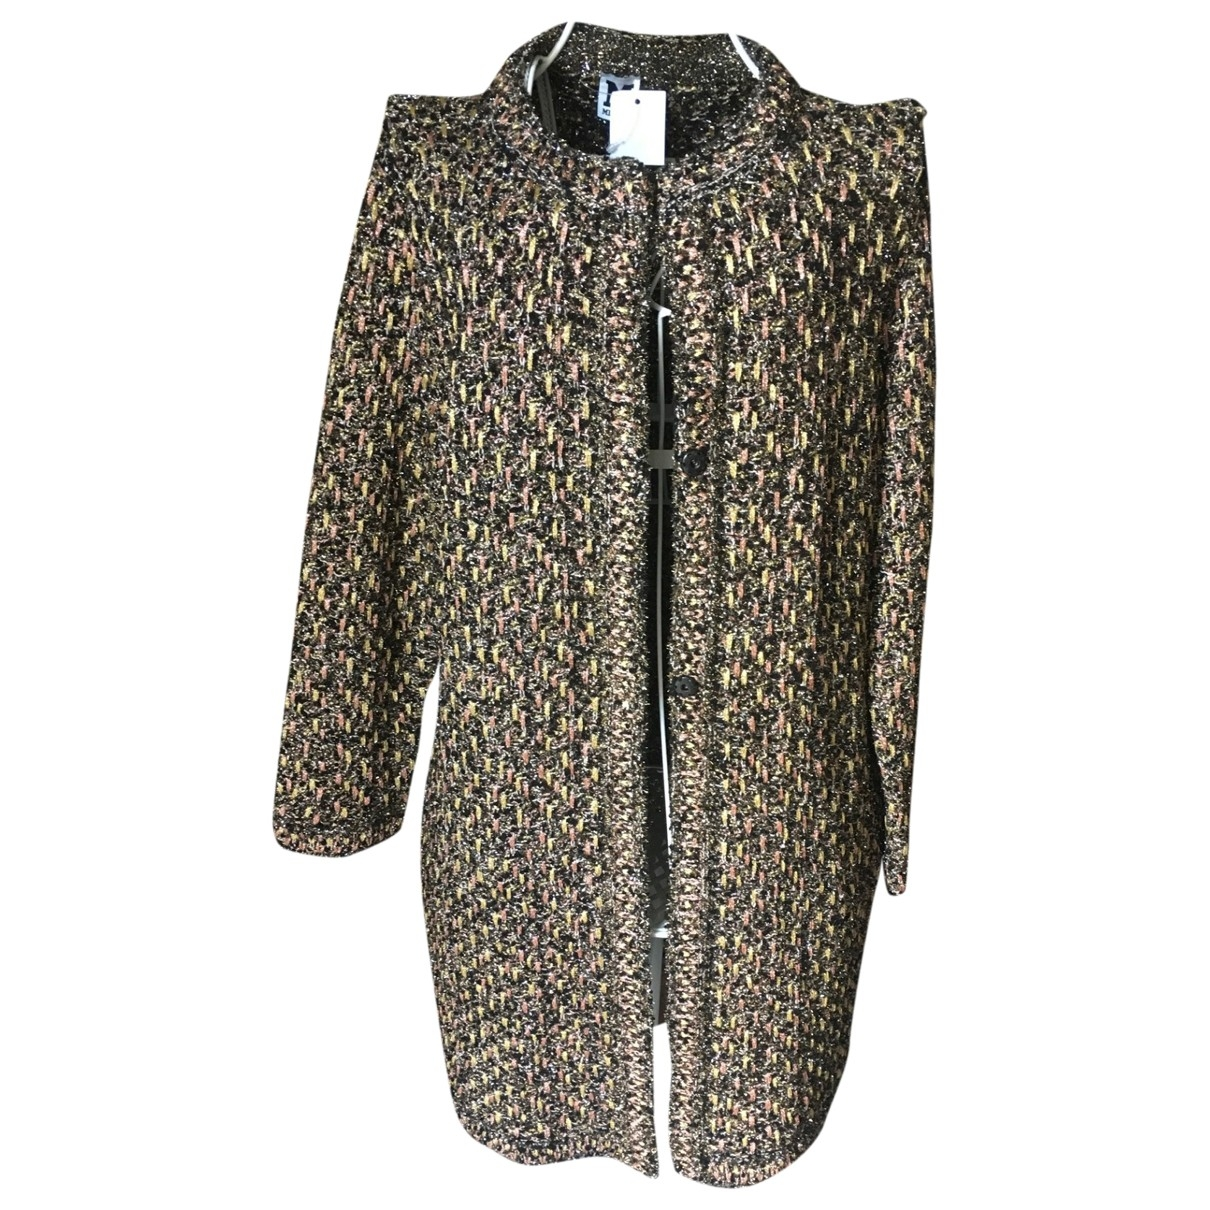 M Missoni \N Multicolour coat for Women 44 IT